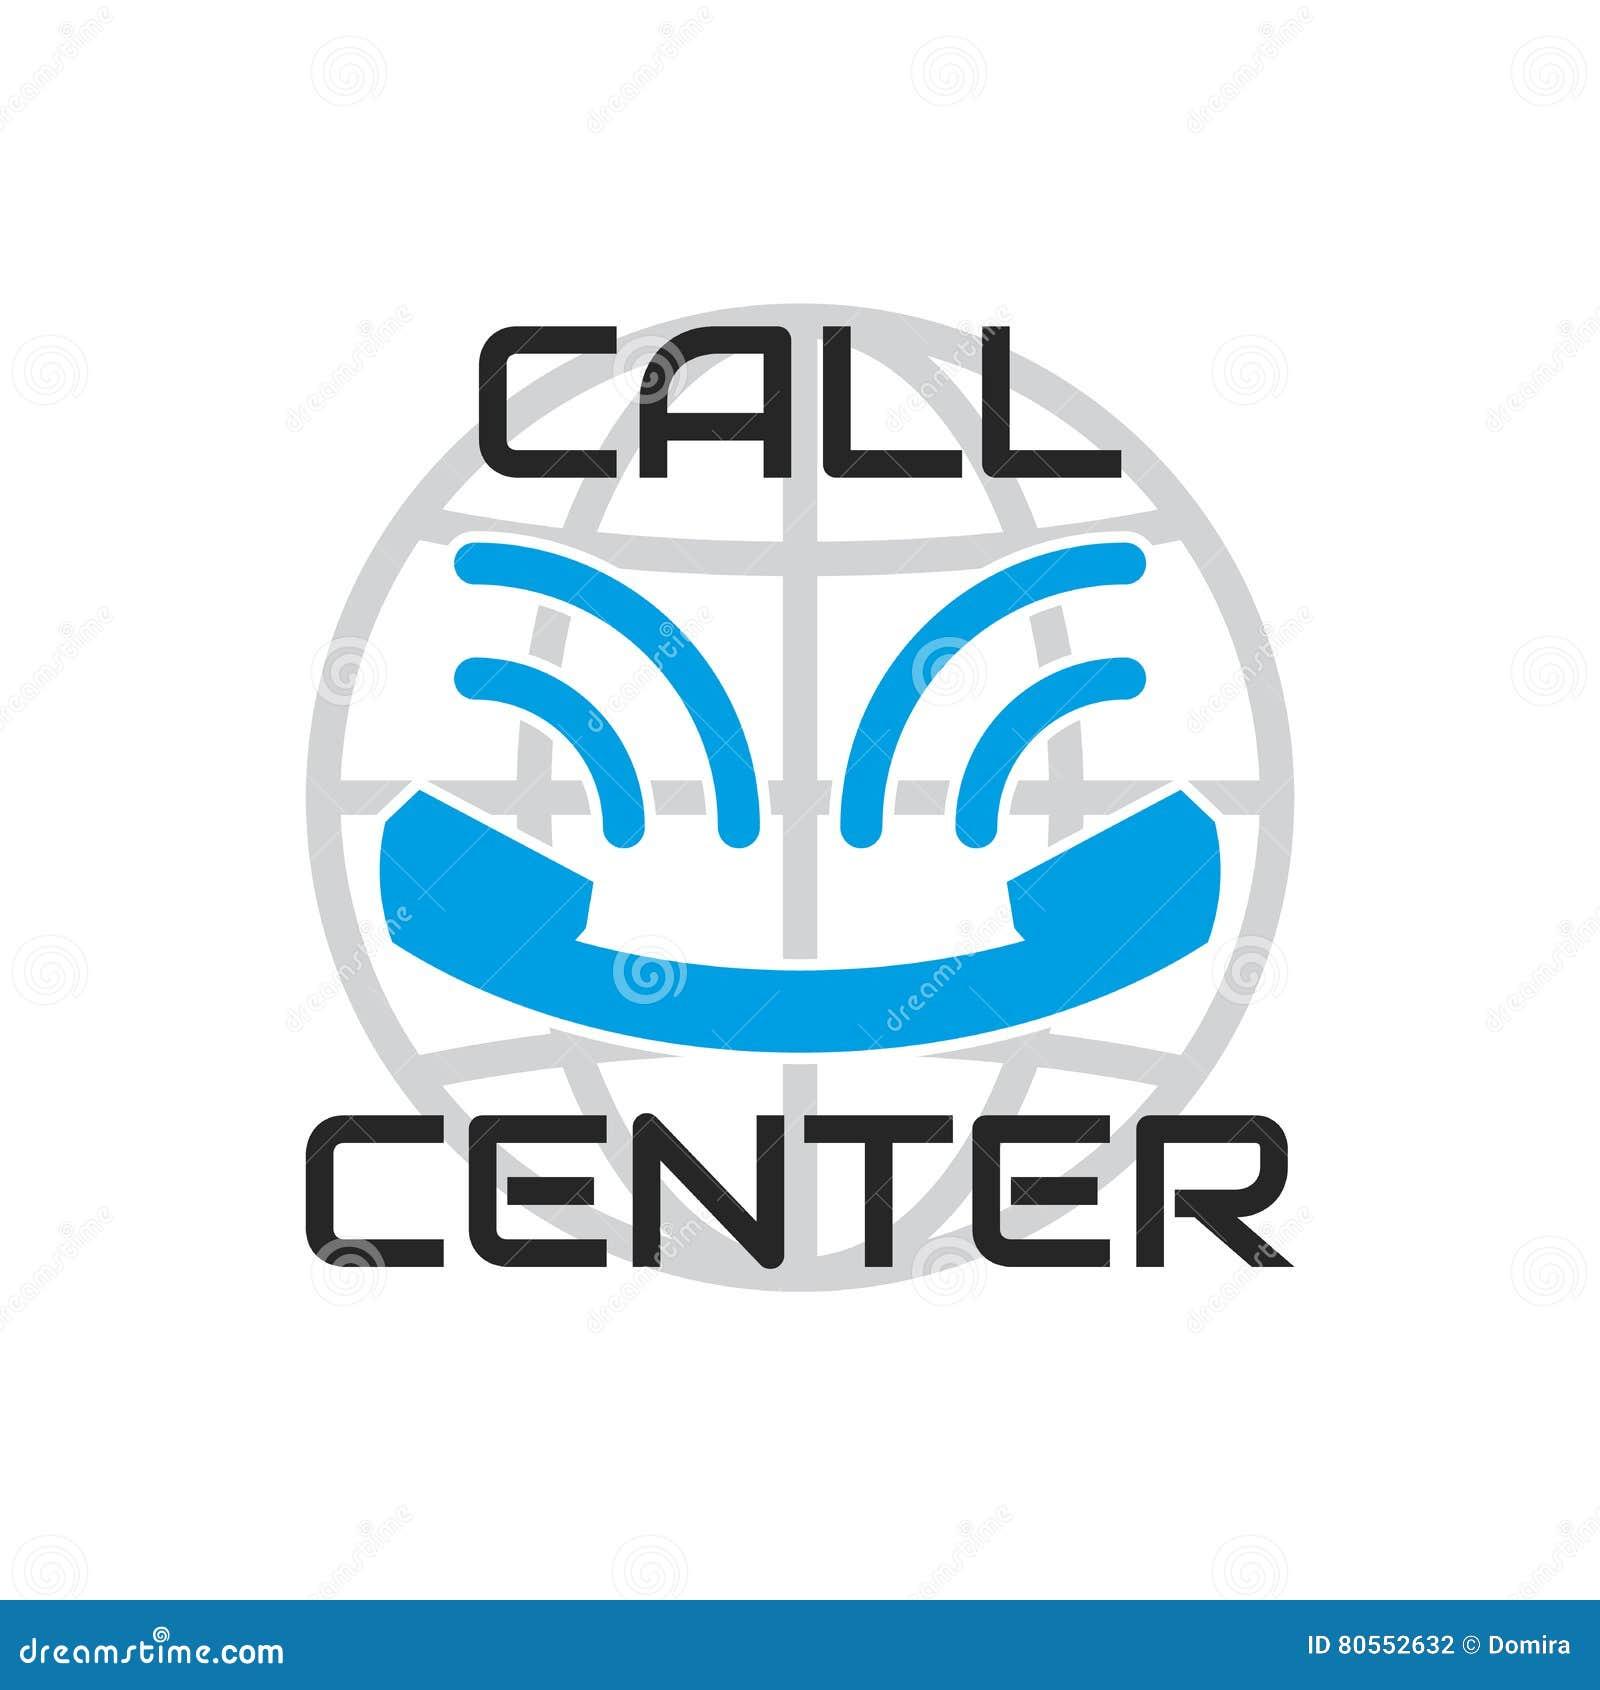 logo call center looks like smile blue old phone handset stock vector illustration of communication centralised 80552632 dreamstime com